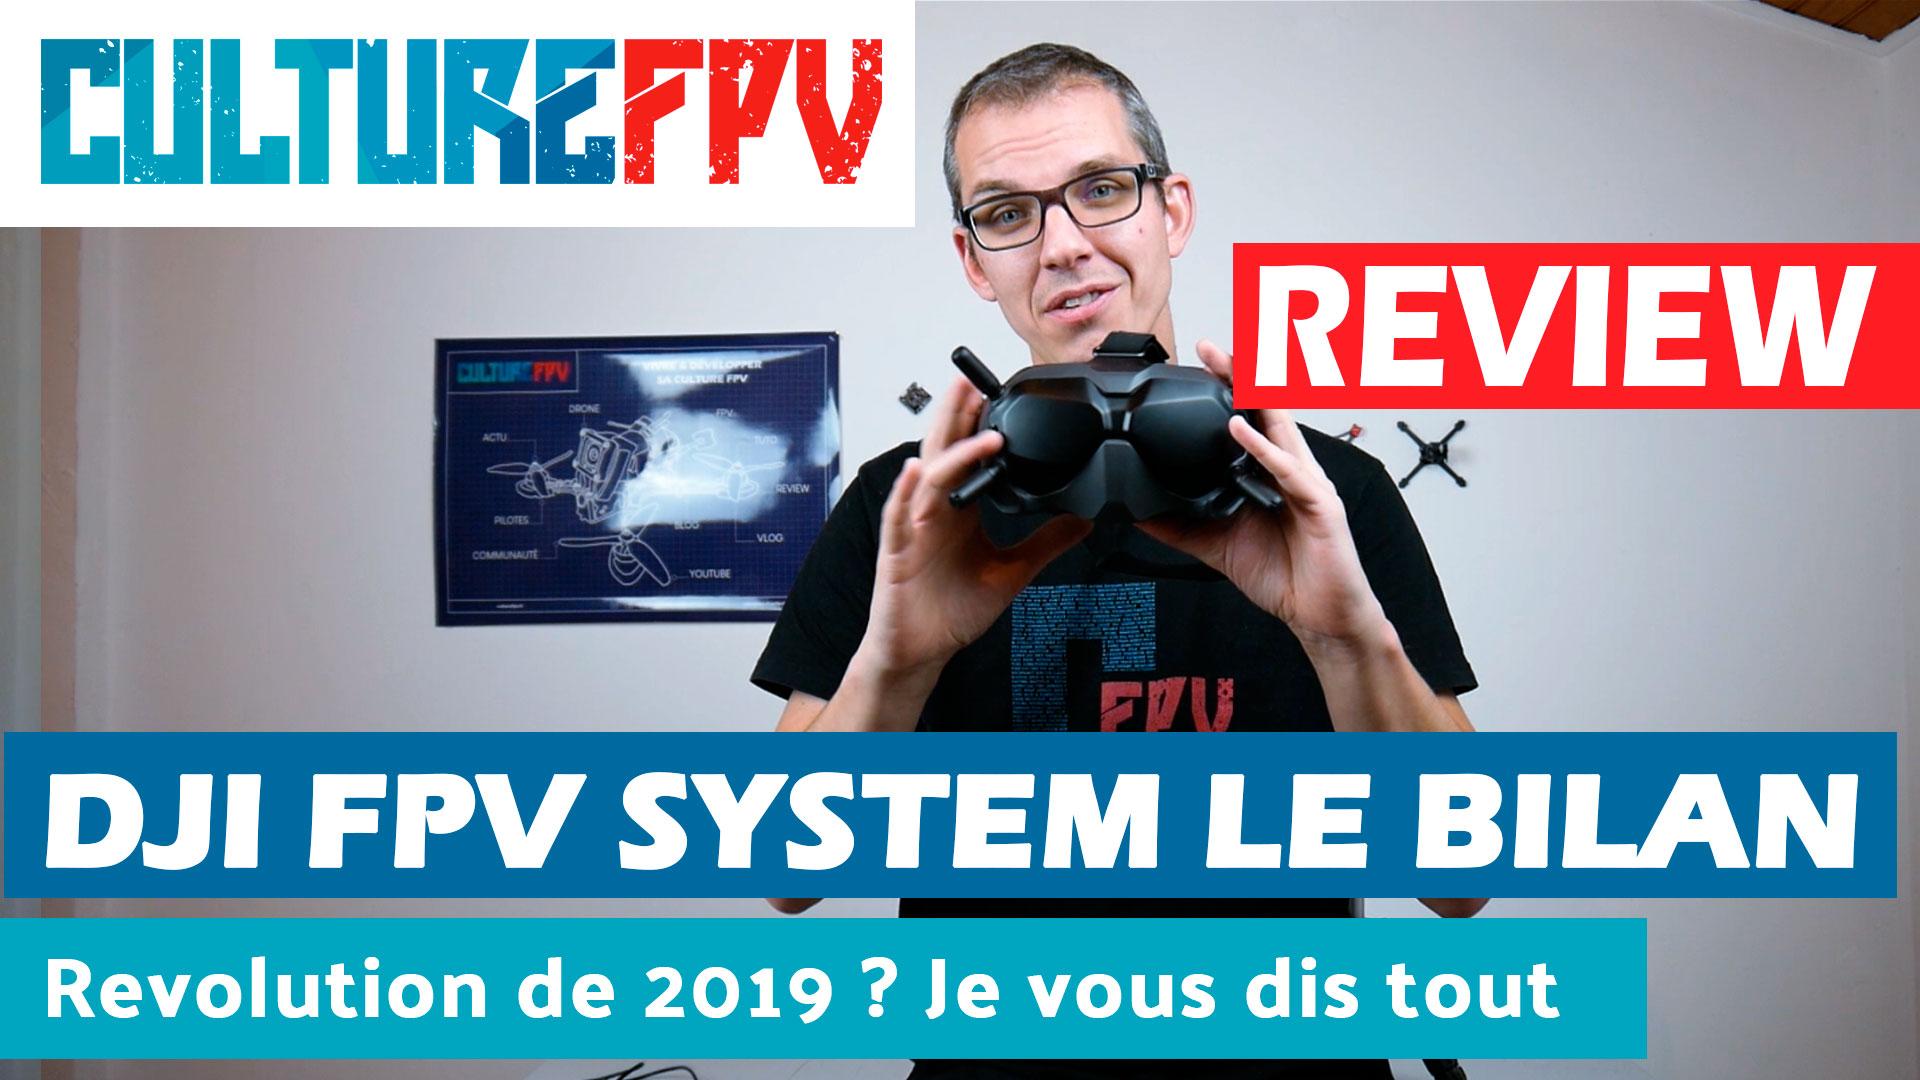 DJY FPV SYSTEM Bilan